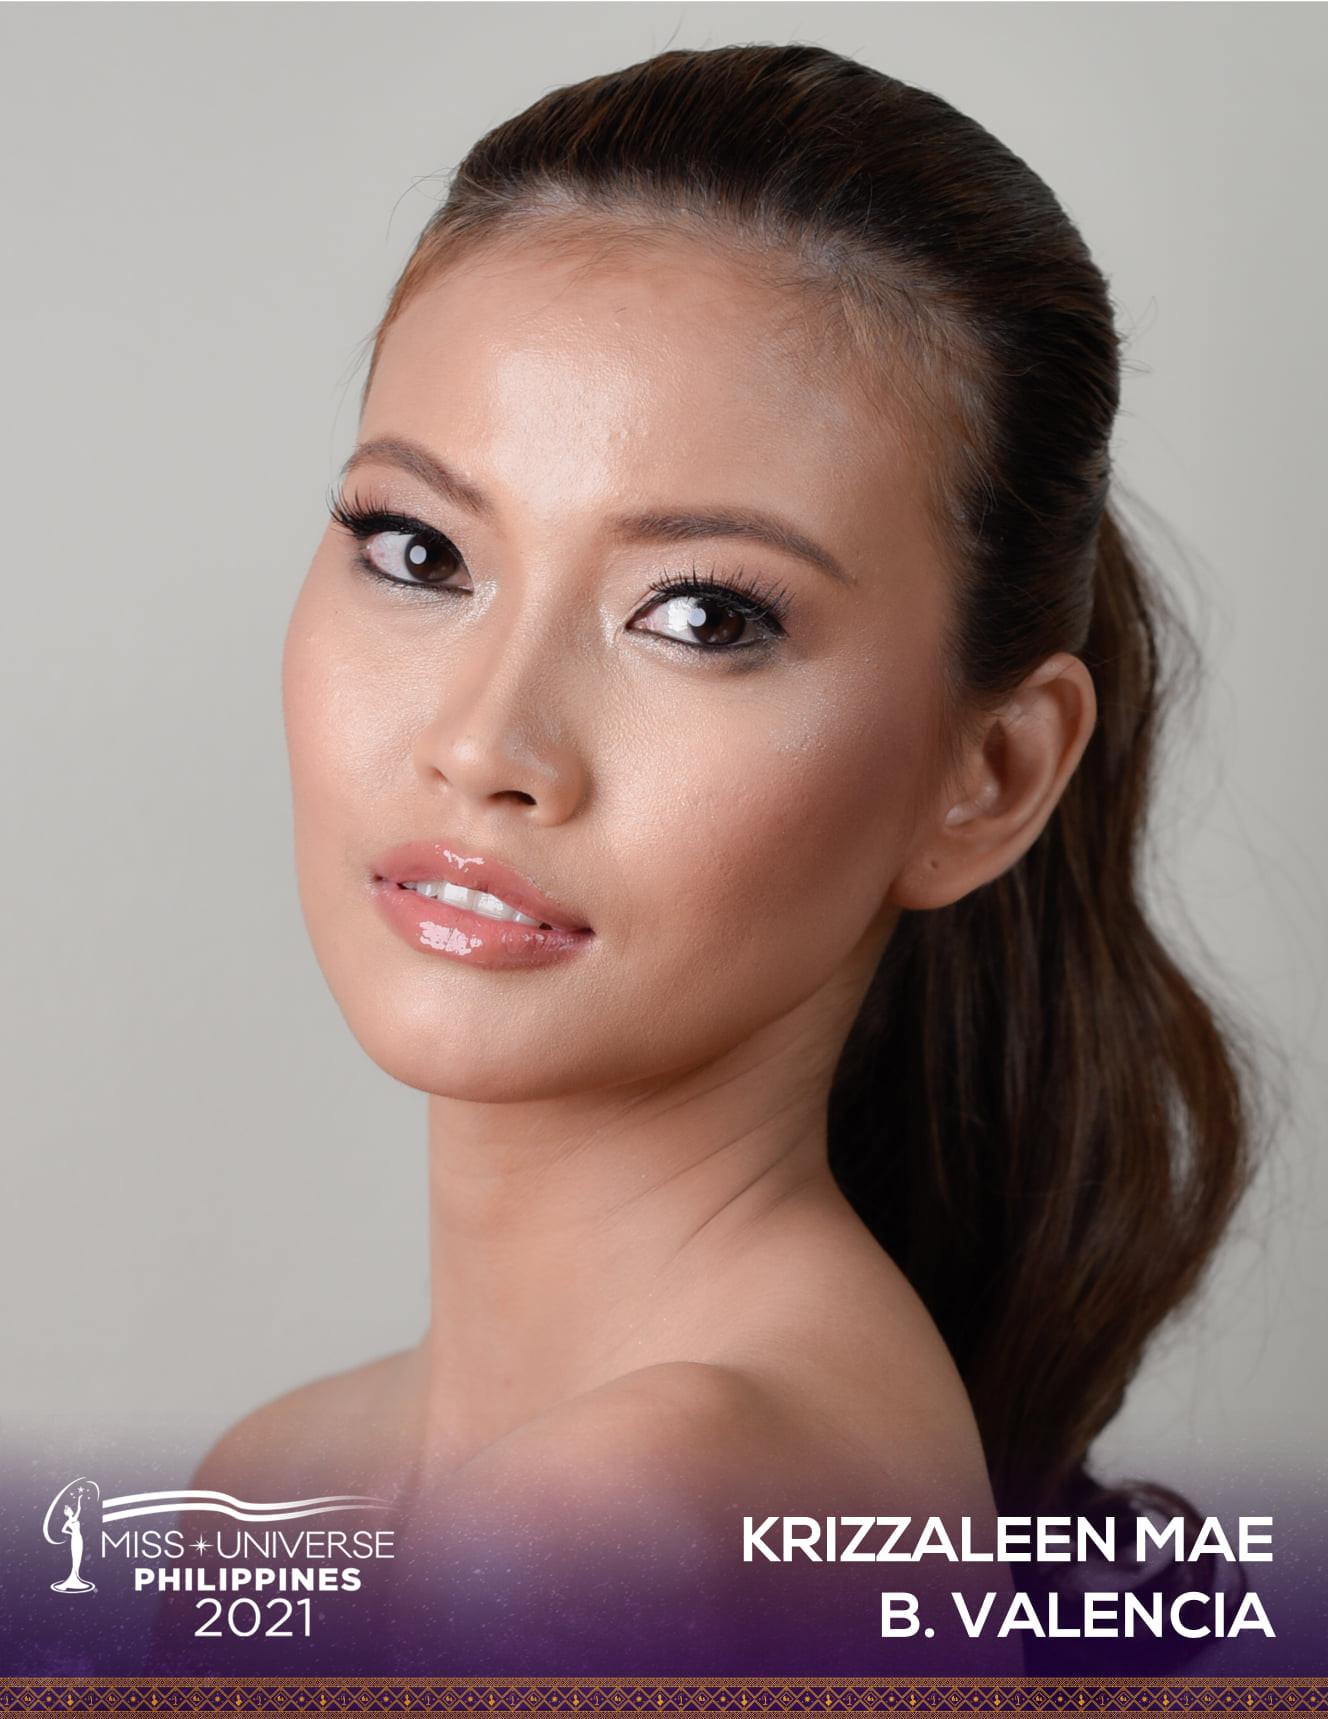 pre-candidatas a miss universe philippines 2021. - Página 7 AlMXkP